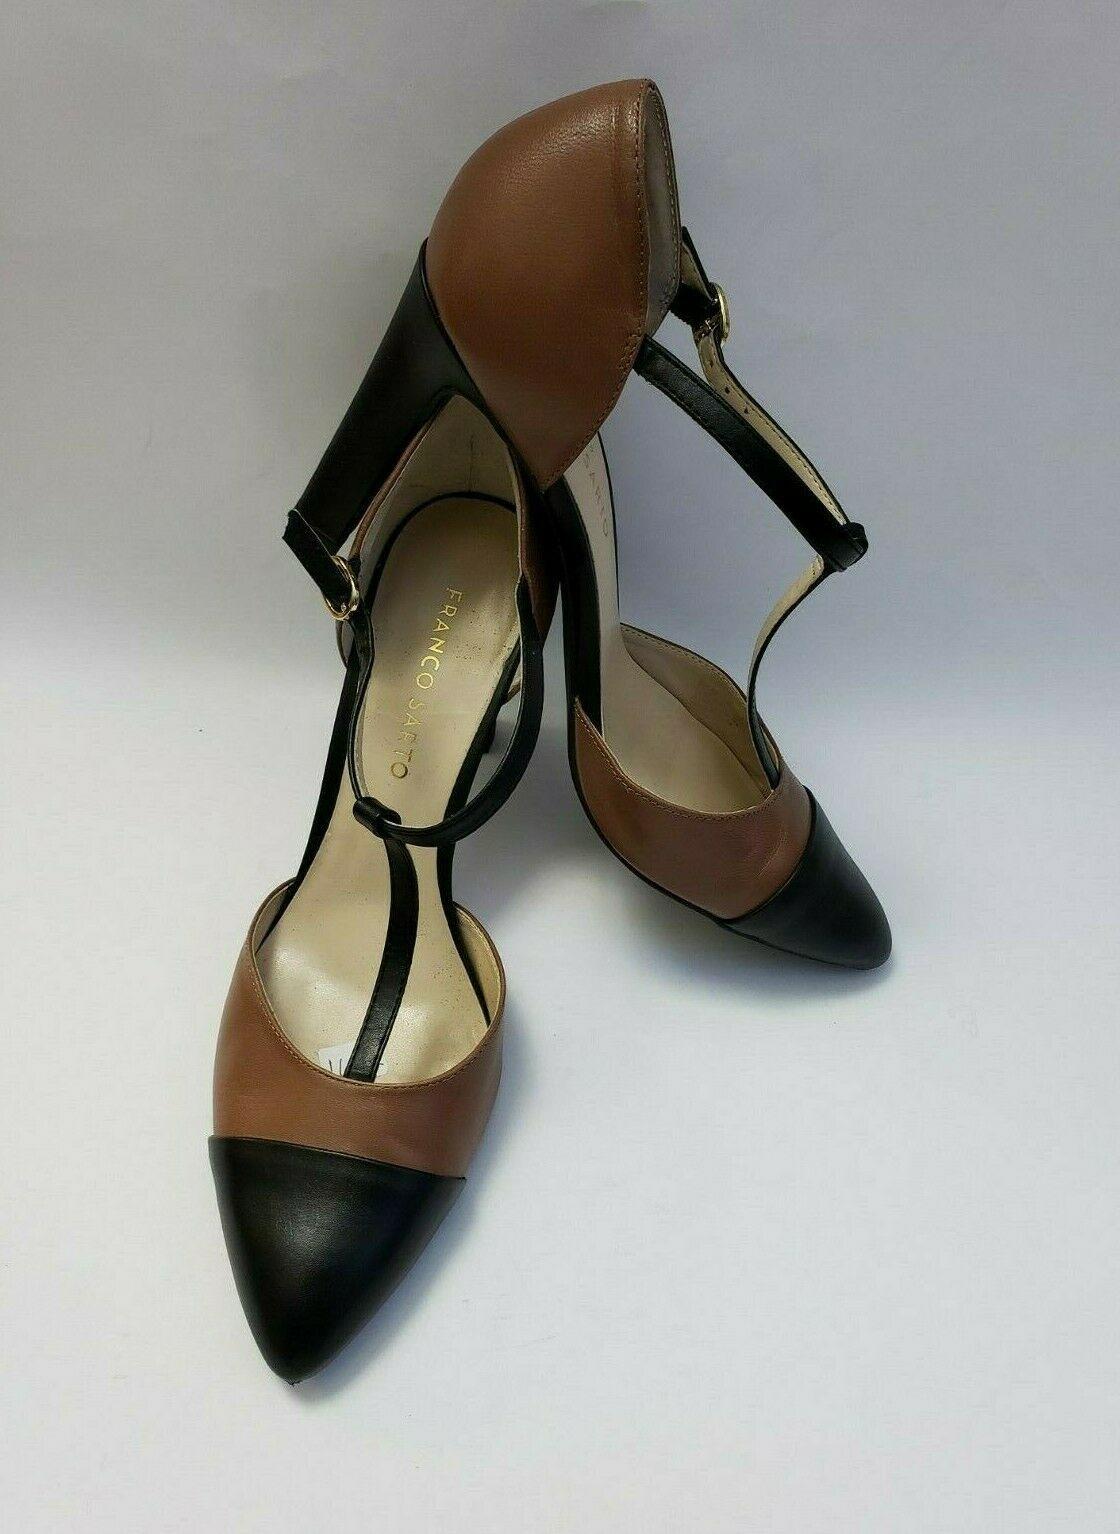 Franco Sarto Shoes Heels Brown Black T-Strap Tanda Womens Size 8.5 M